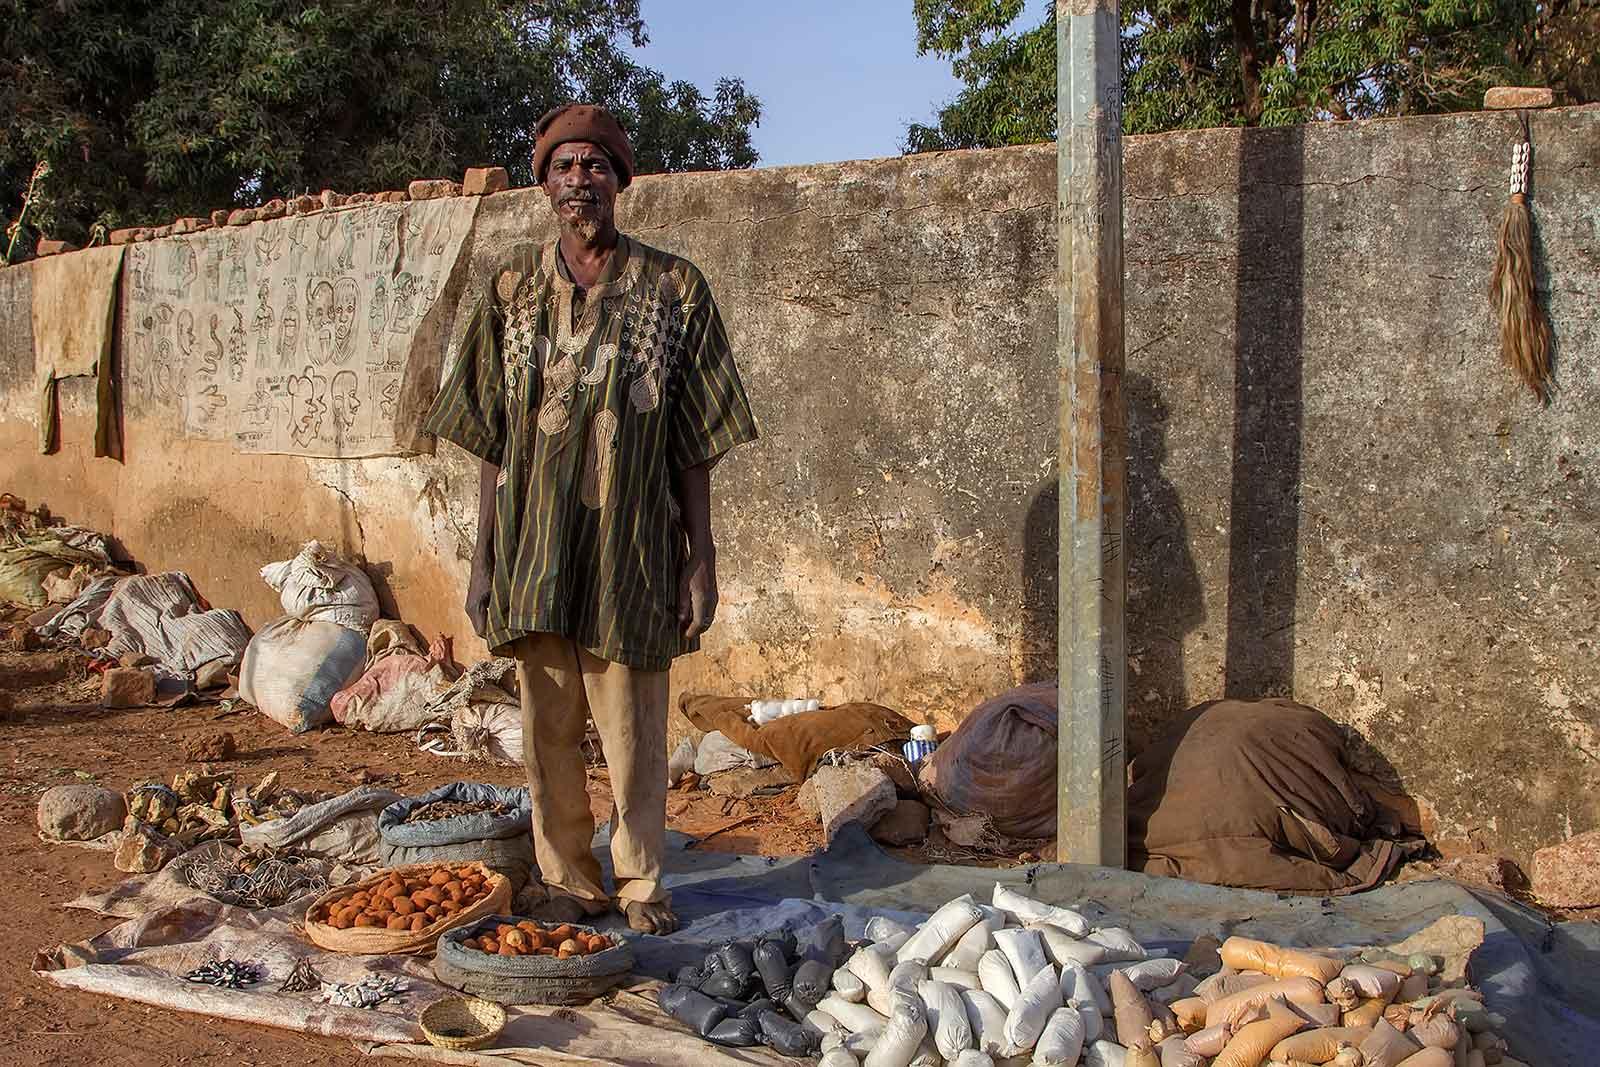 voodoo-doctor-banfora-burkina-faso-africa-4